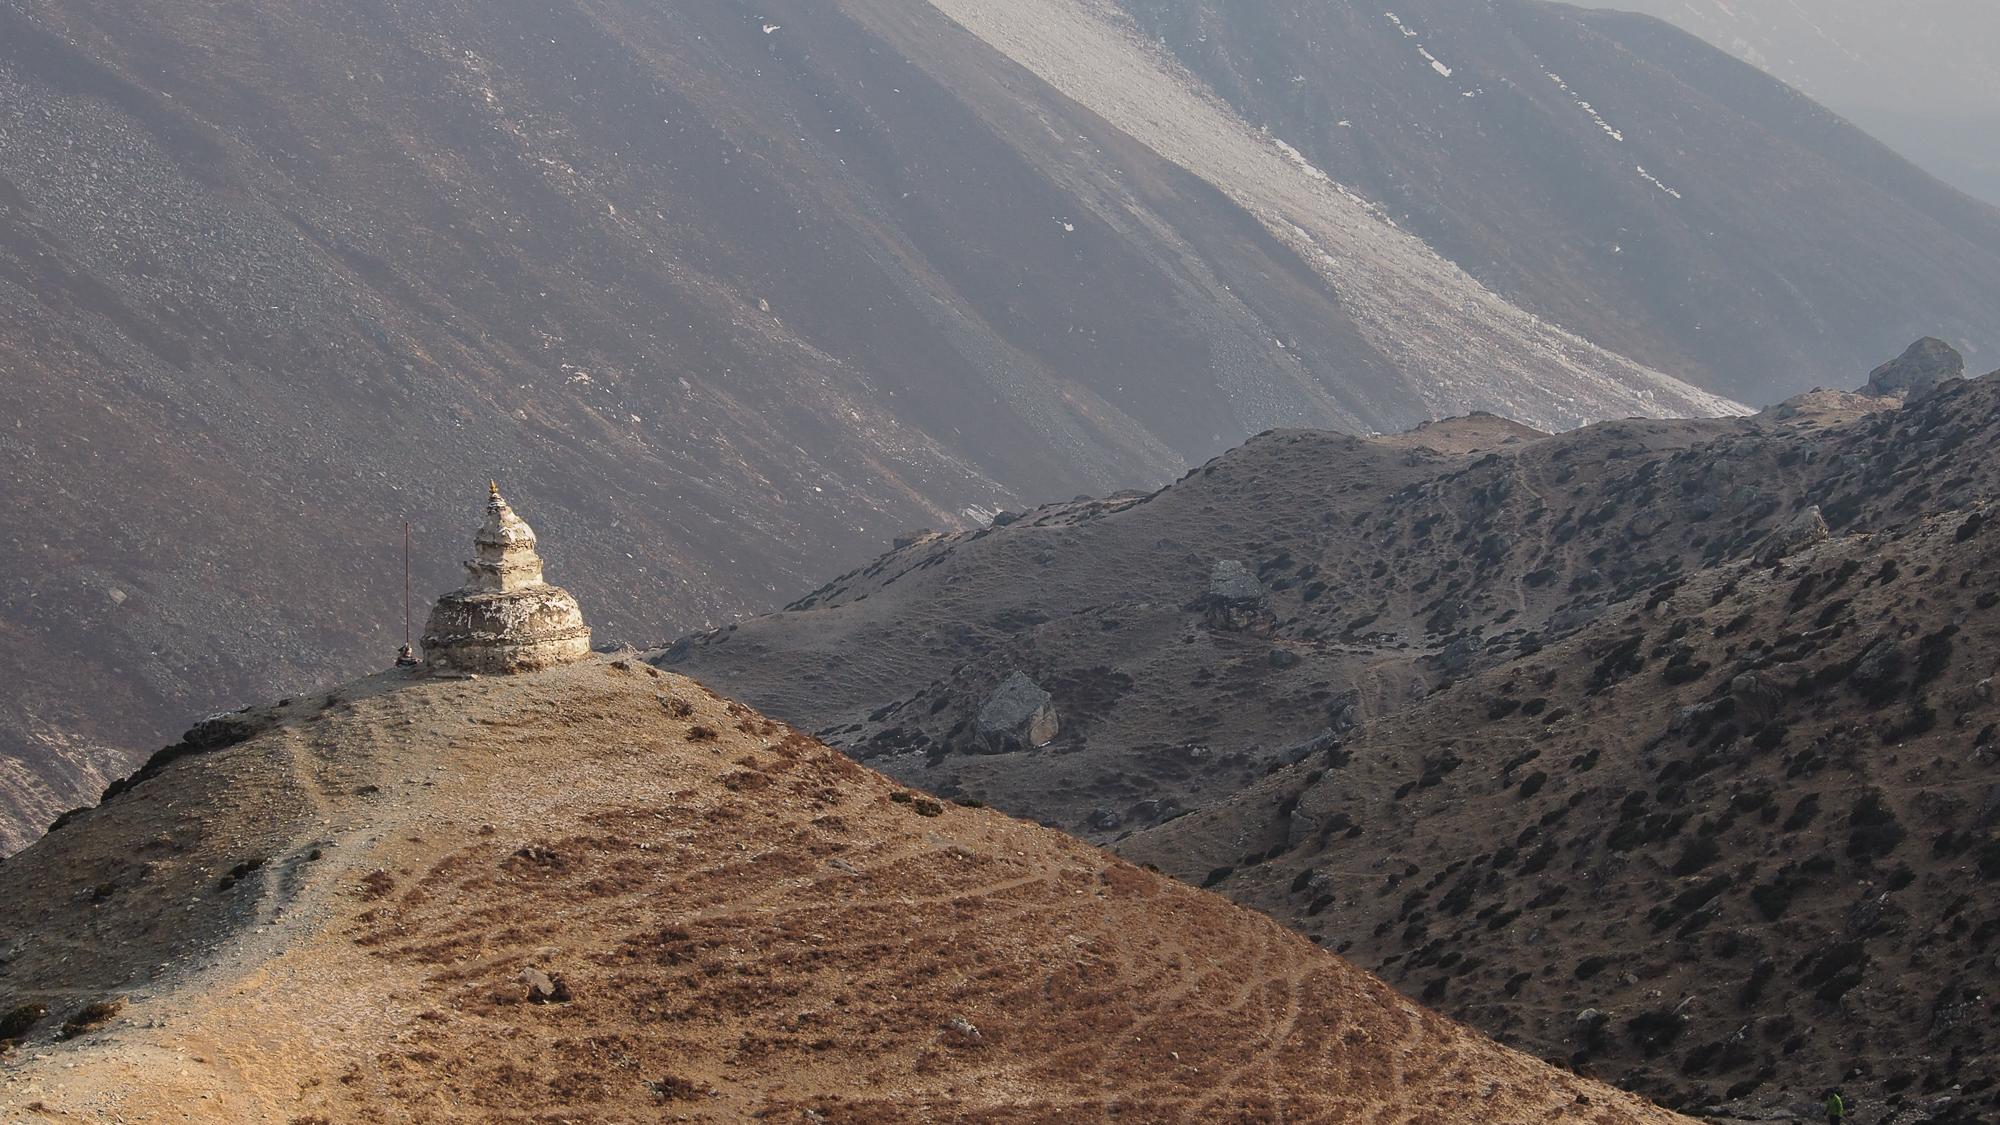 Dingboche stupa, Nepal